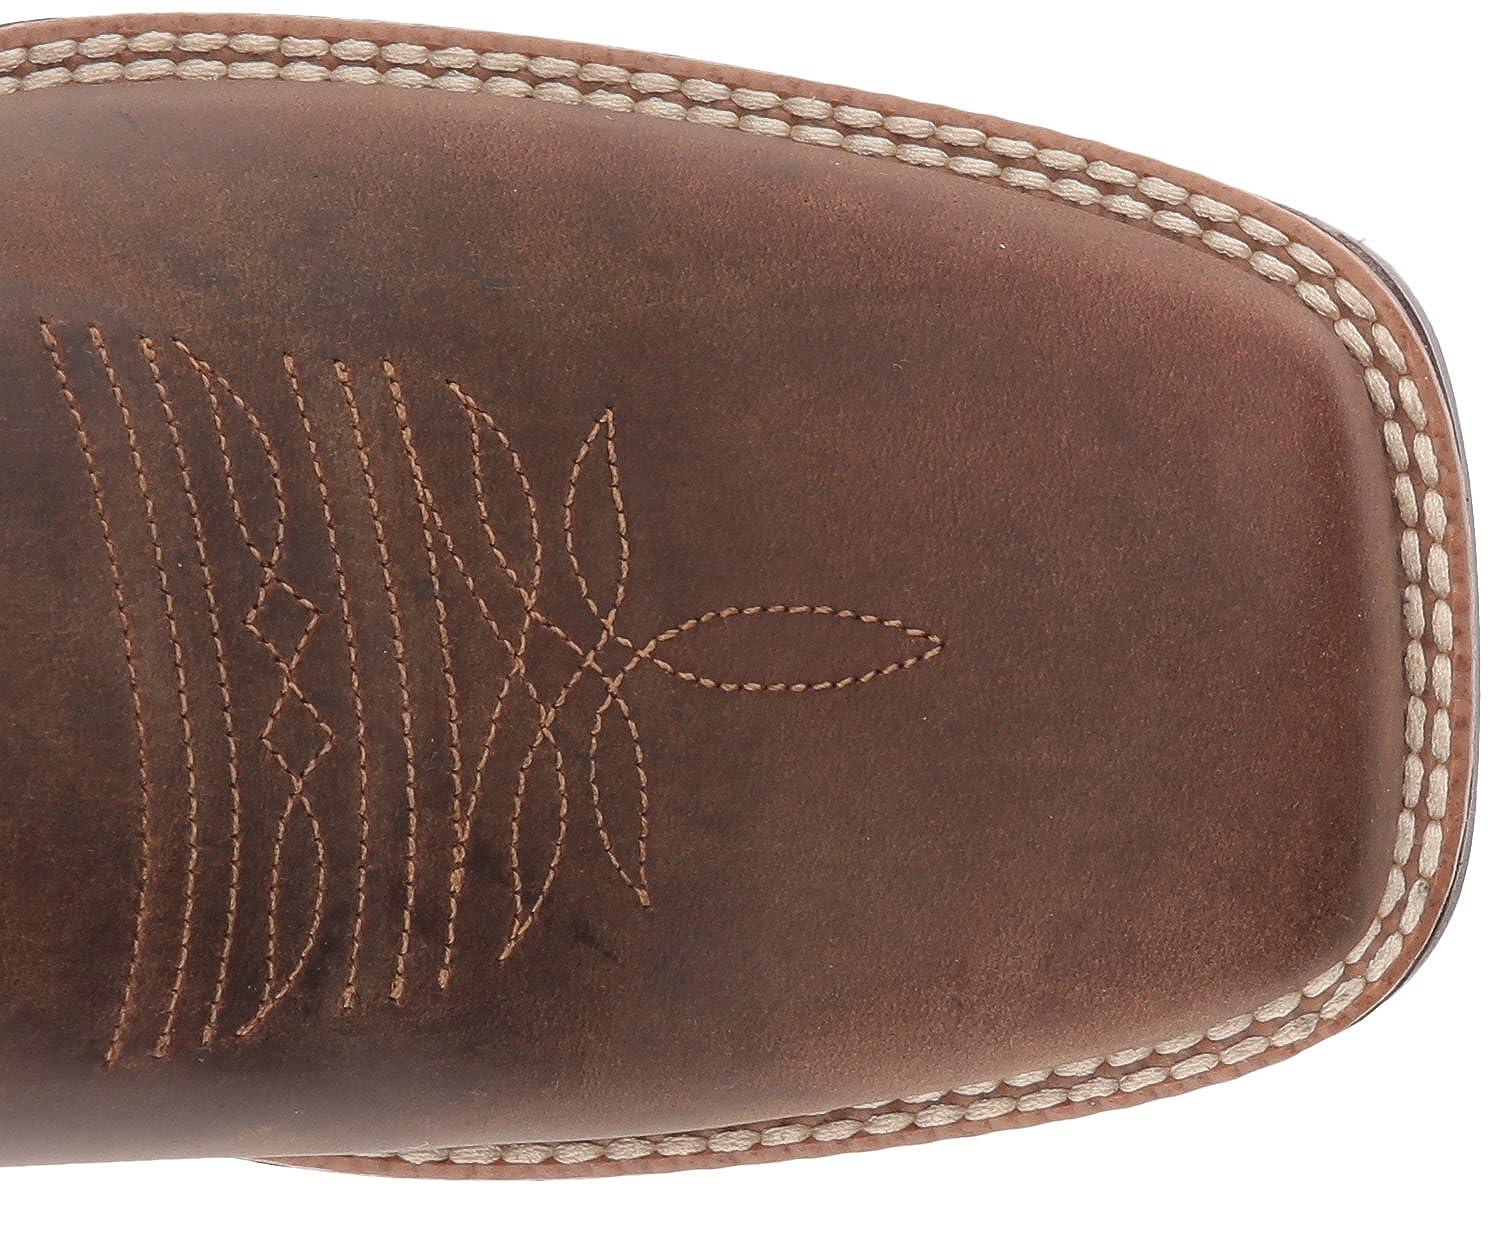 Ariat Stiefel Stiefel Stiefel Venttek Ultra Braun   37 db5d88